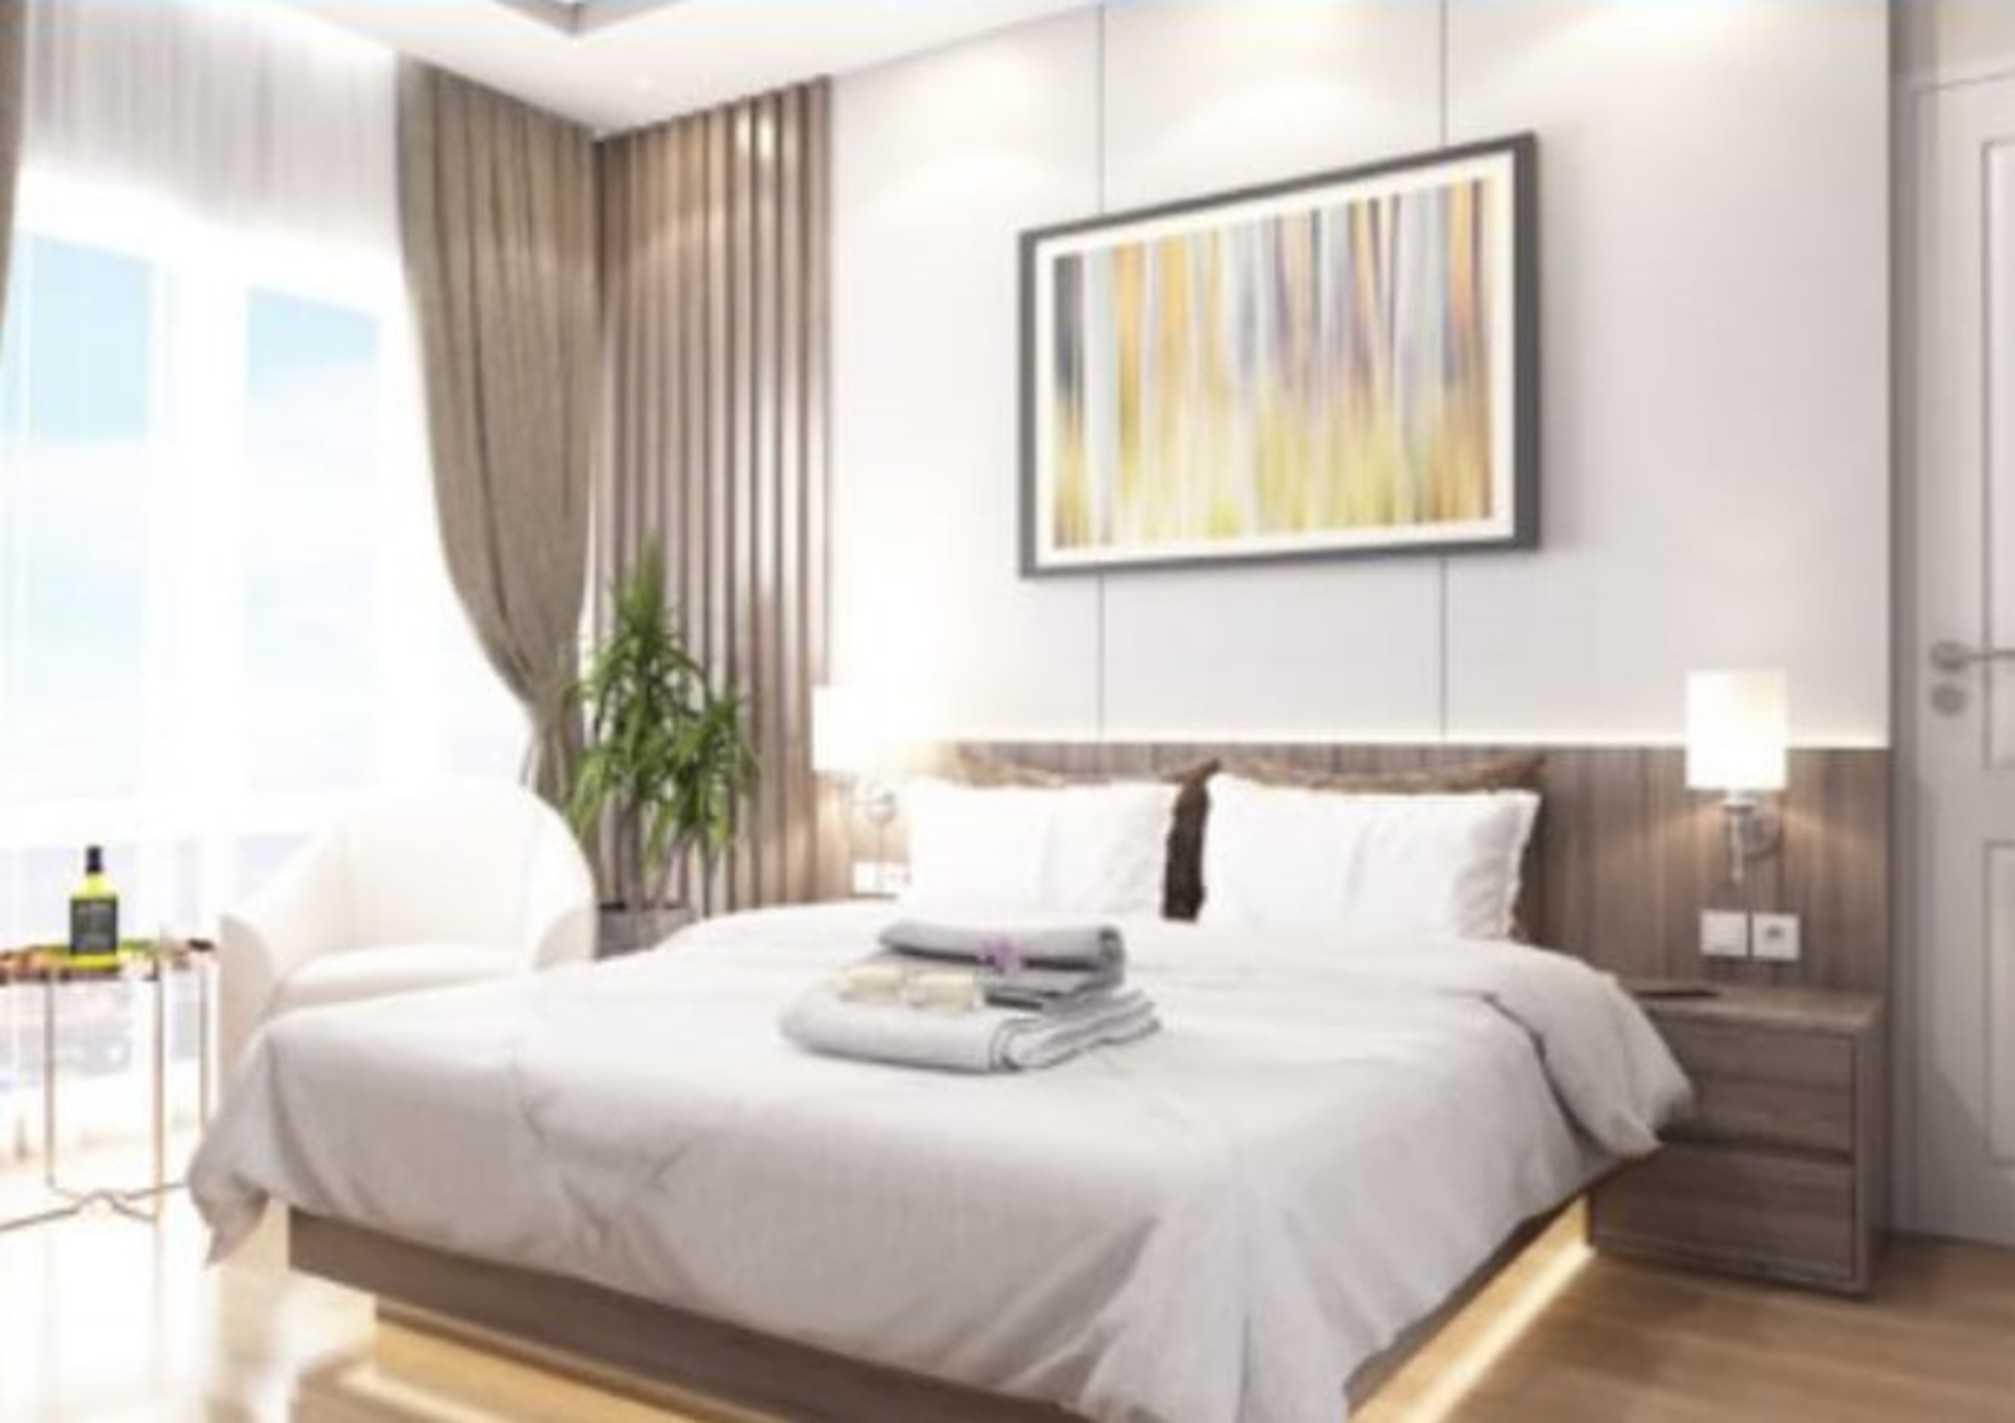 Jasa Design and Build PT. Nusaref Karya Gemilang di Tangerang